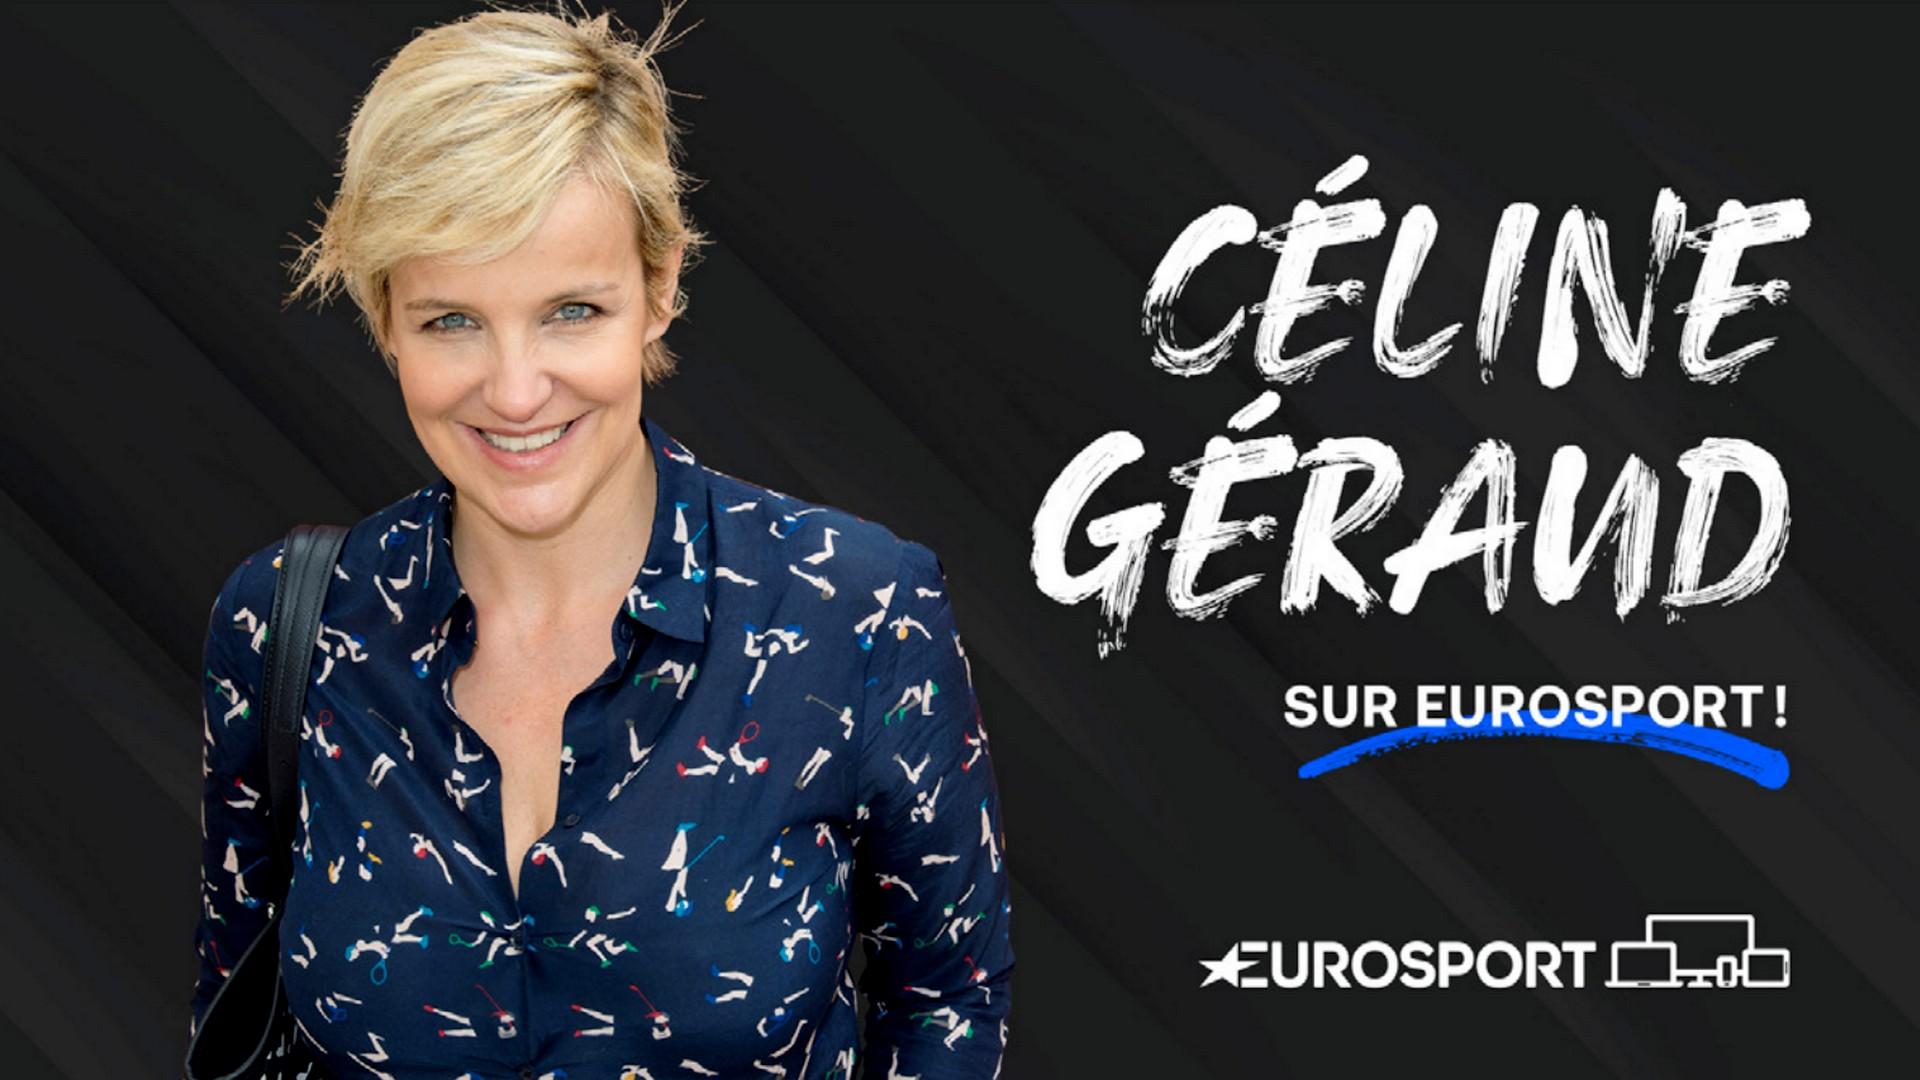 Céline Géraud x Eurosport (télé) 2021